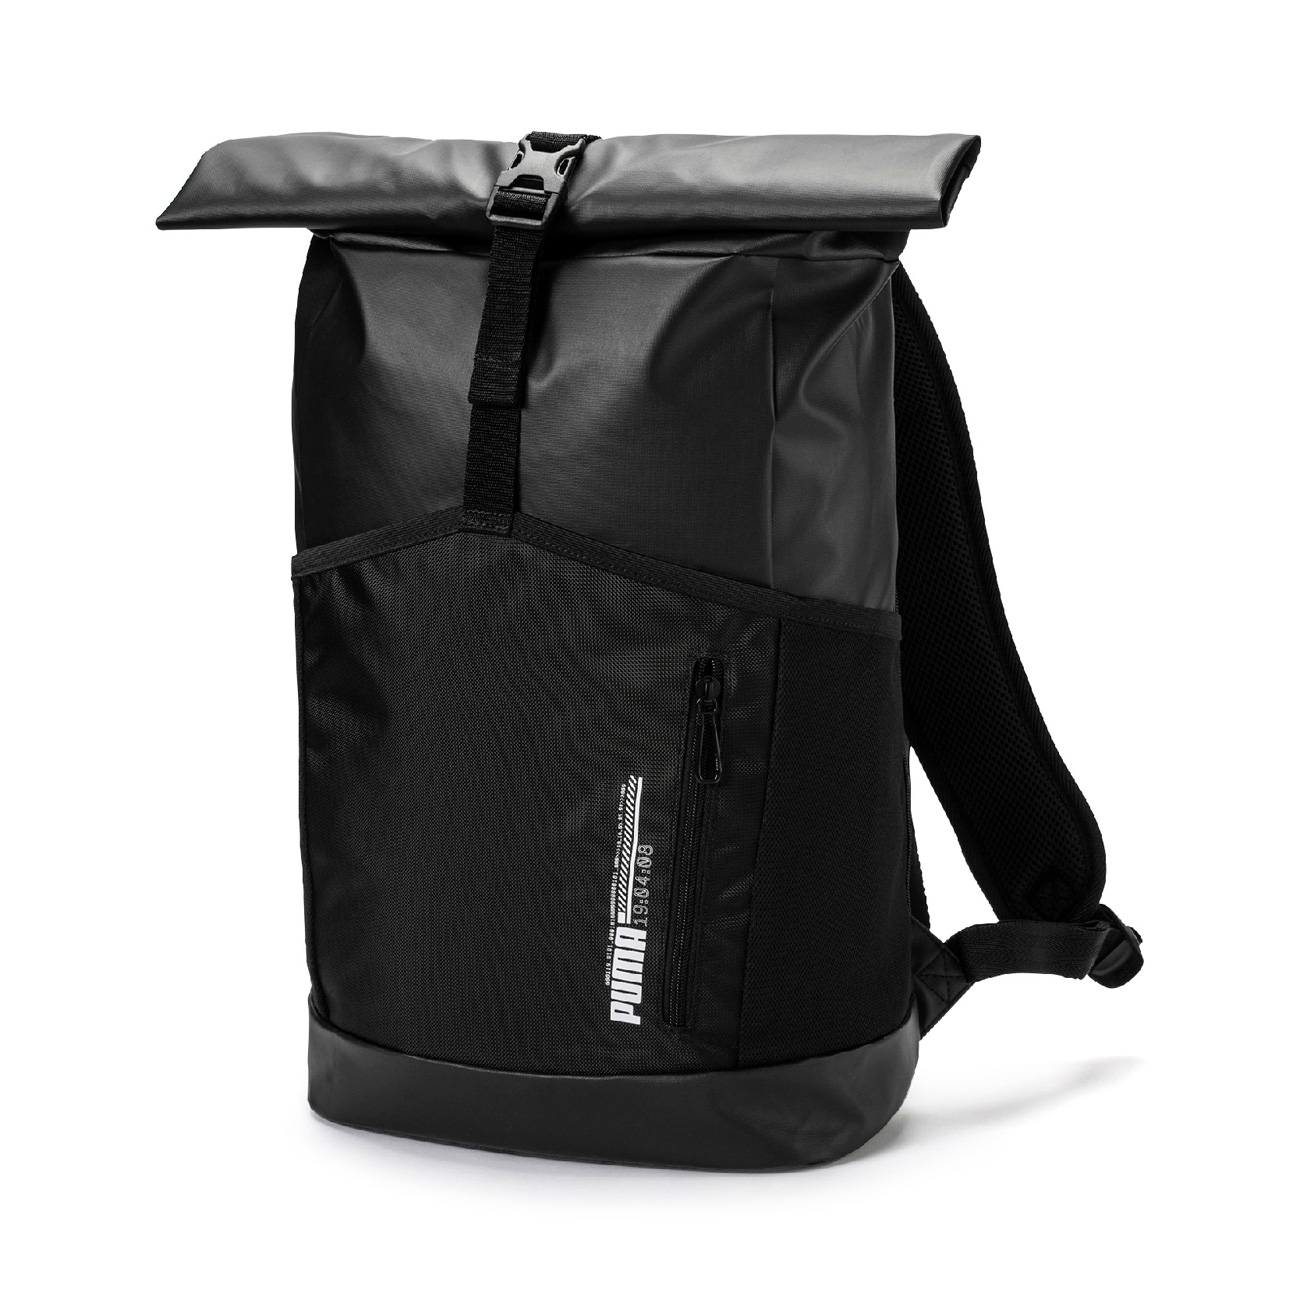 d754213649 Puma Energy Black Rolltop Backpack